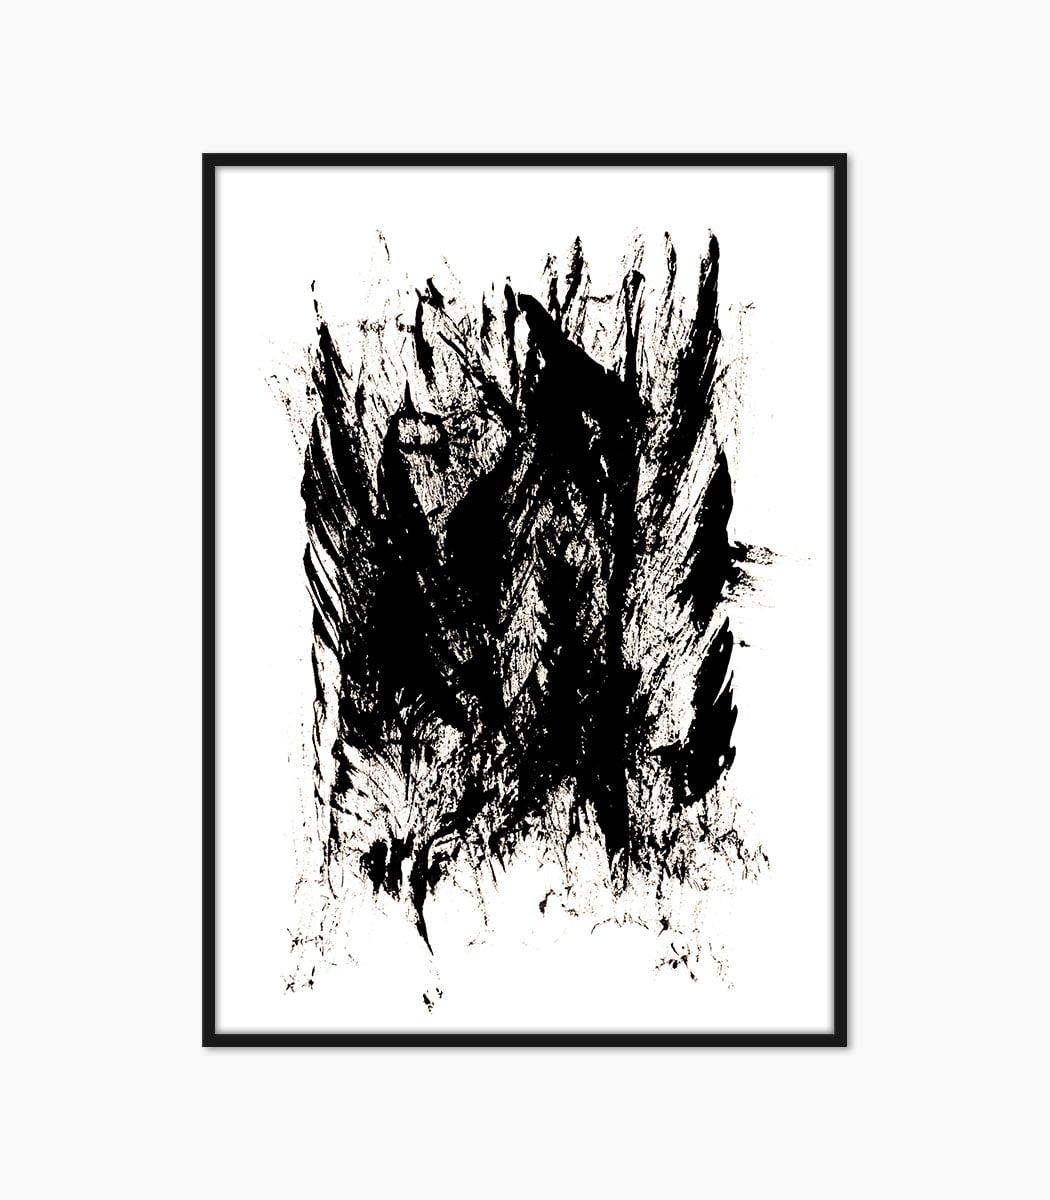 pictura design abstract creata manual si printata la calitate superioara numai pe www.artwall.ro